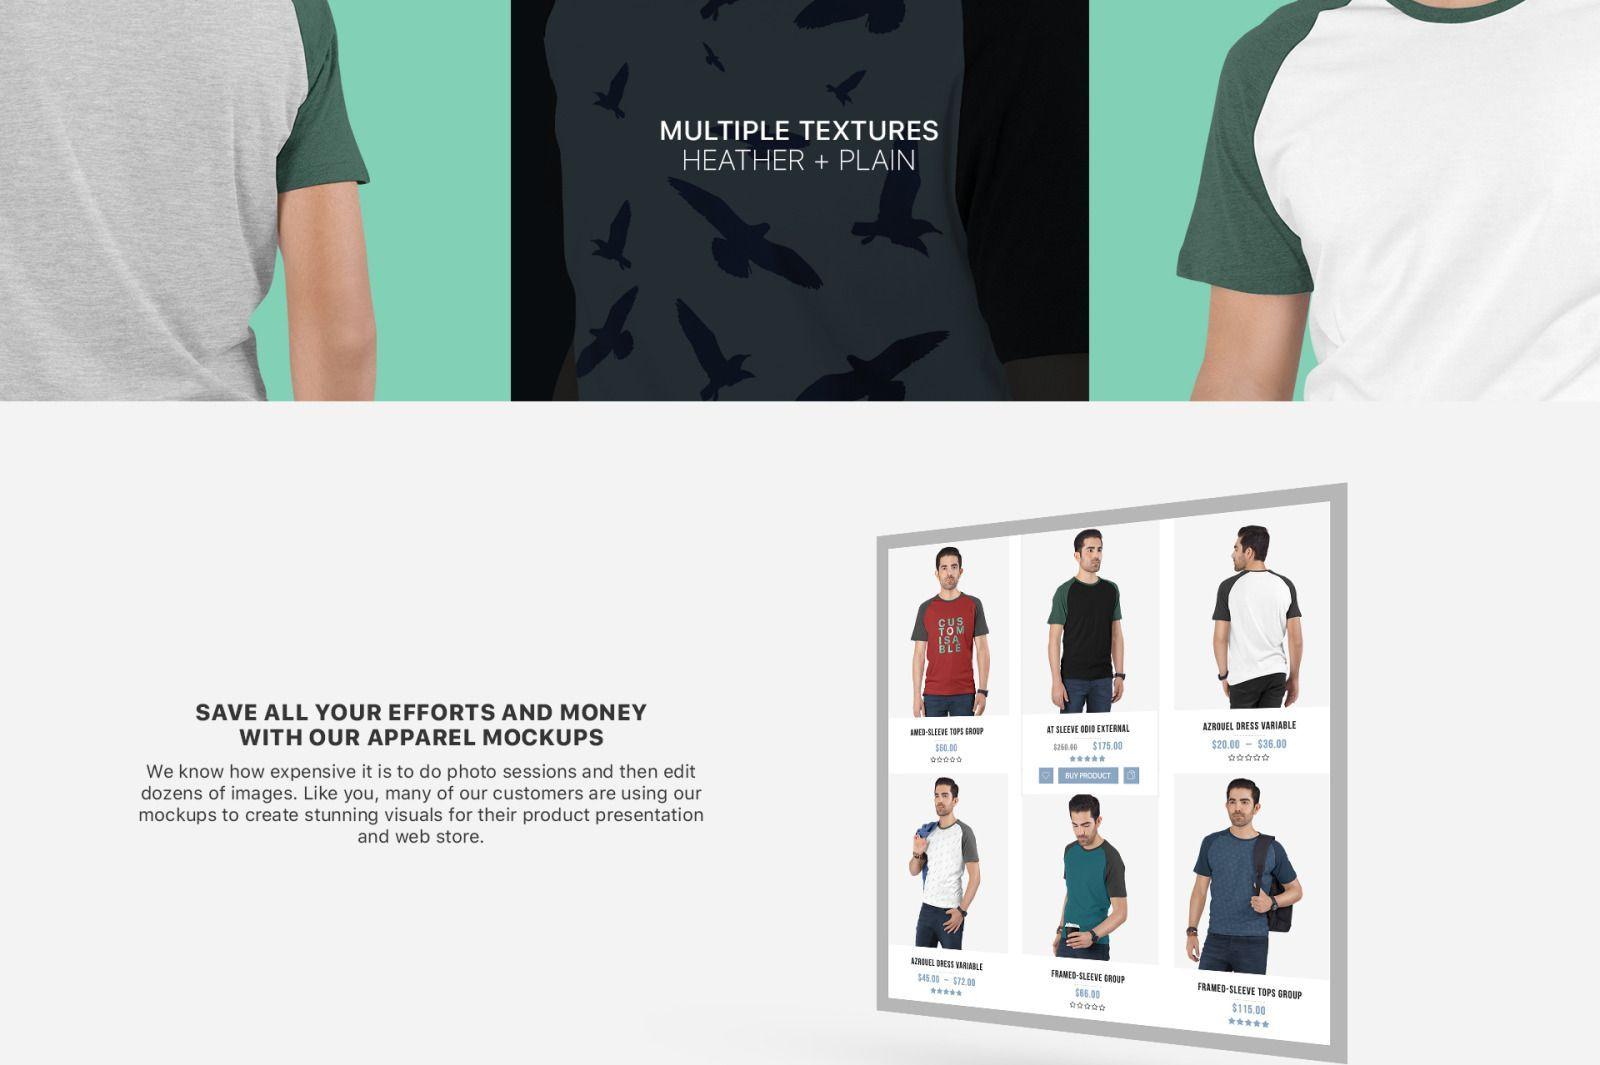 Download Men S Raglan T Shirt Mockup Set In Apparel Mockups On Yellow Images Creative Store Men S Raglan T Shirt Mockup Set In 2020 Clothing Mockup Shirt Mockup Mens Raglan